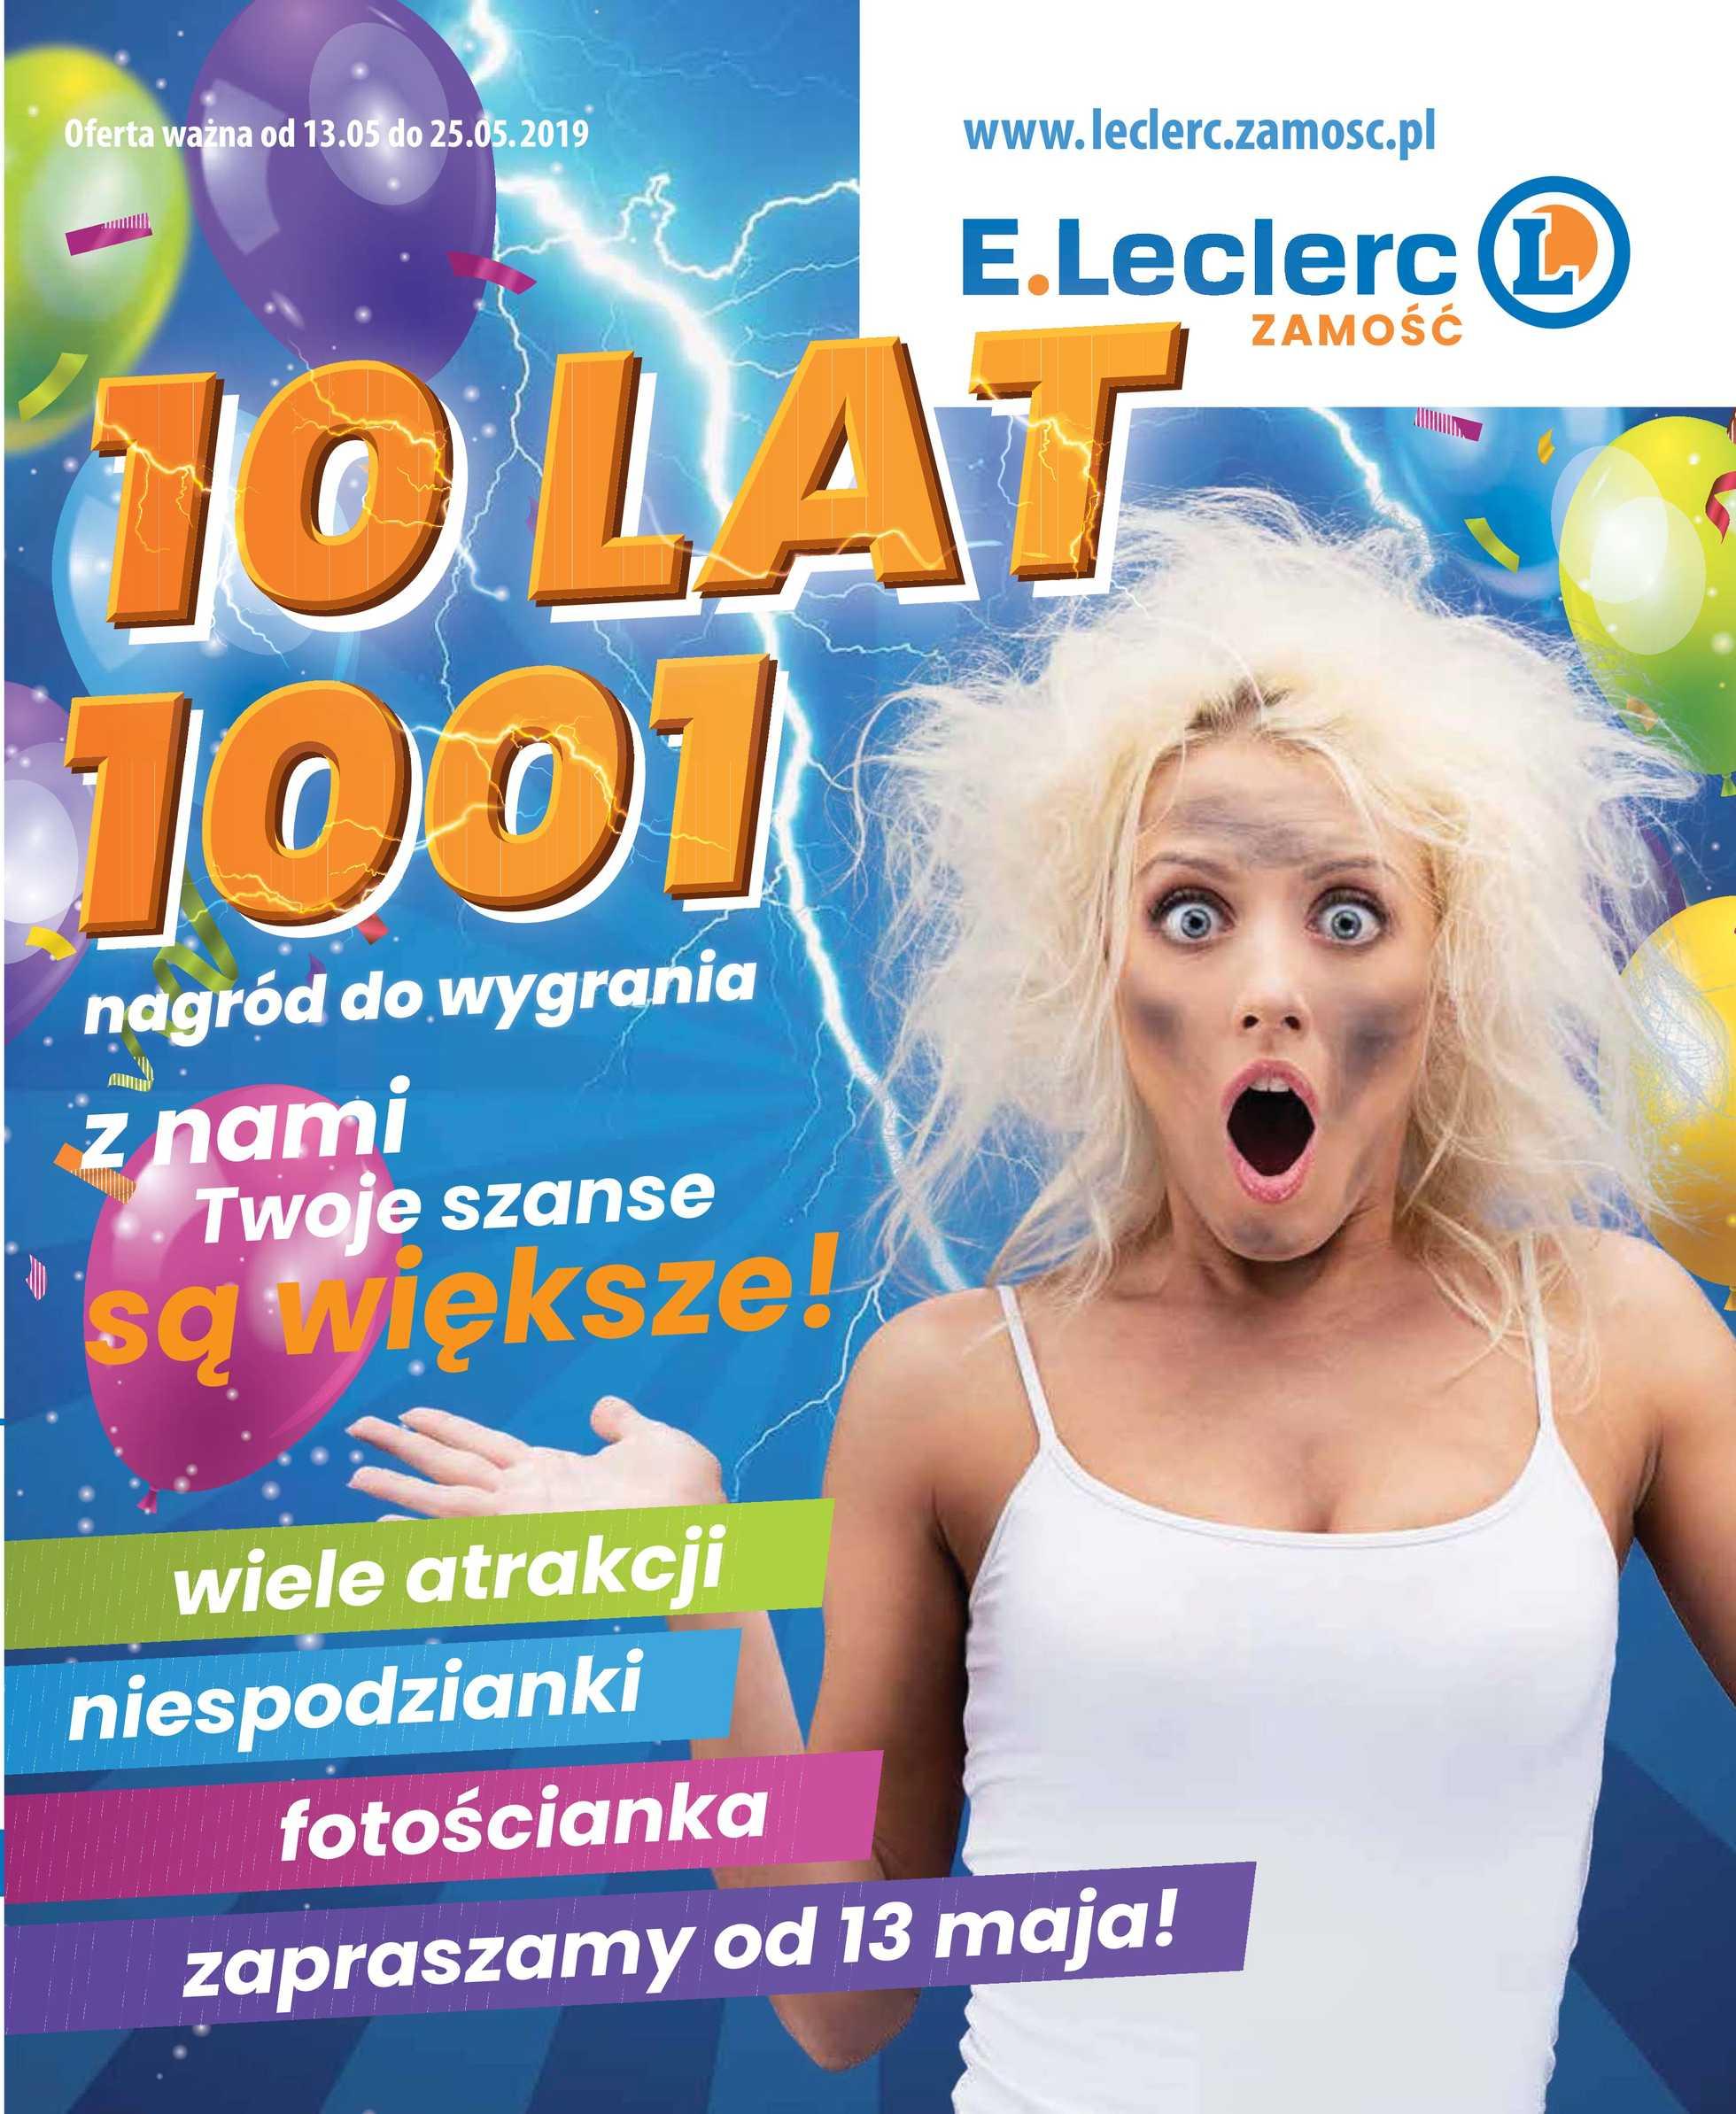 E.Leclerc - gazetka promocyjna ważna od 13.05.2019 do 25.05.2019 - strona 1.